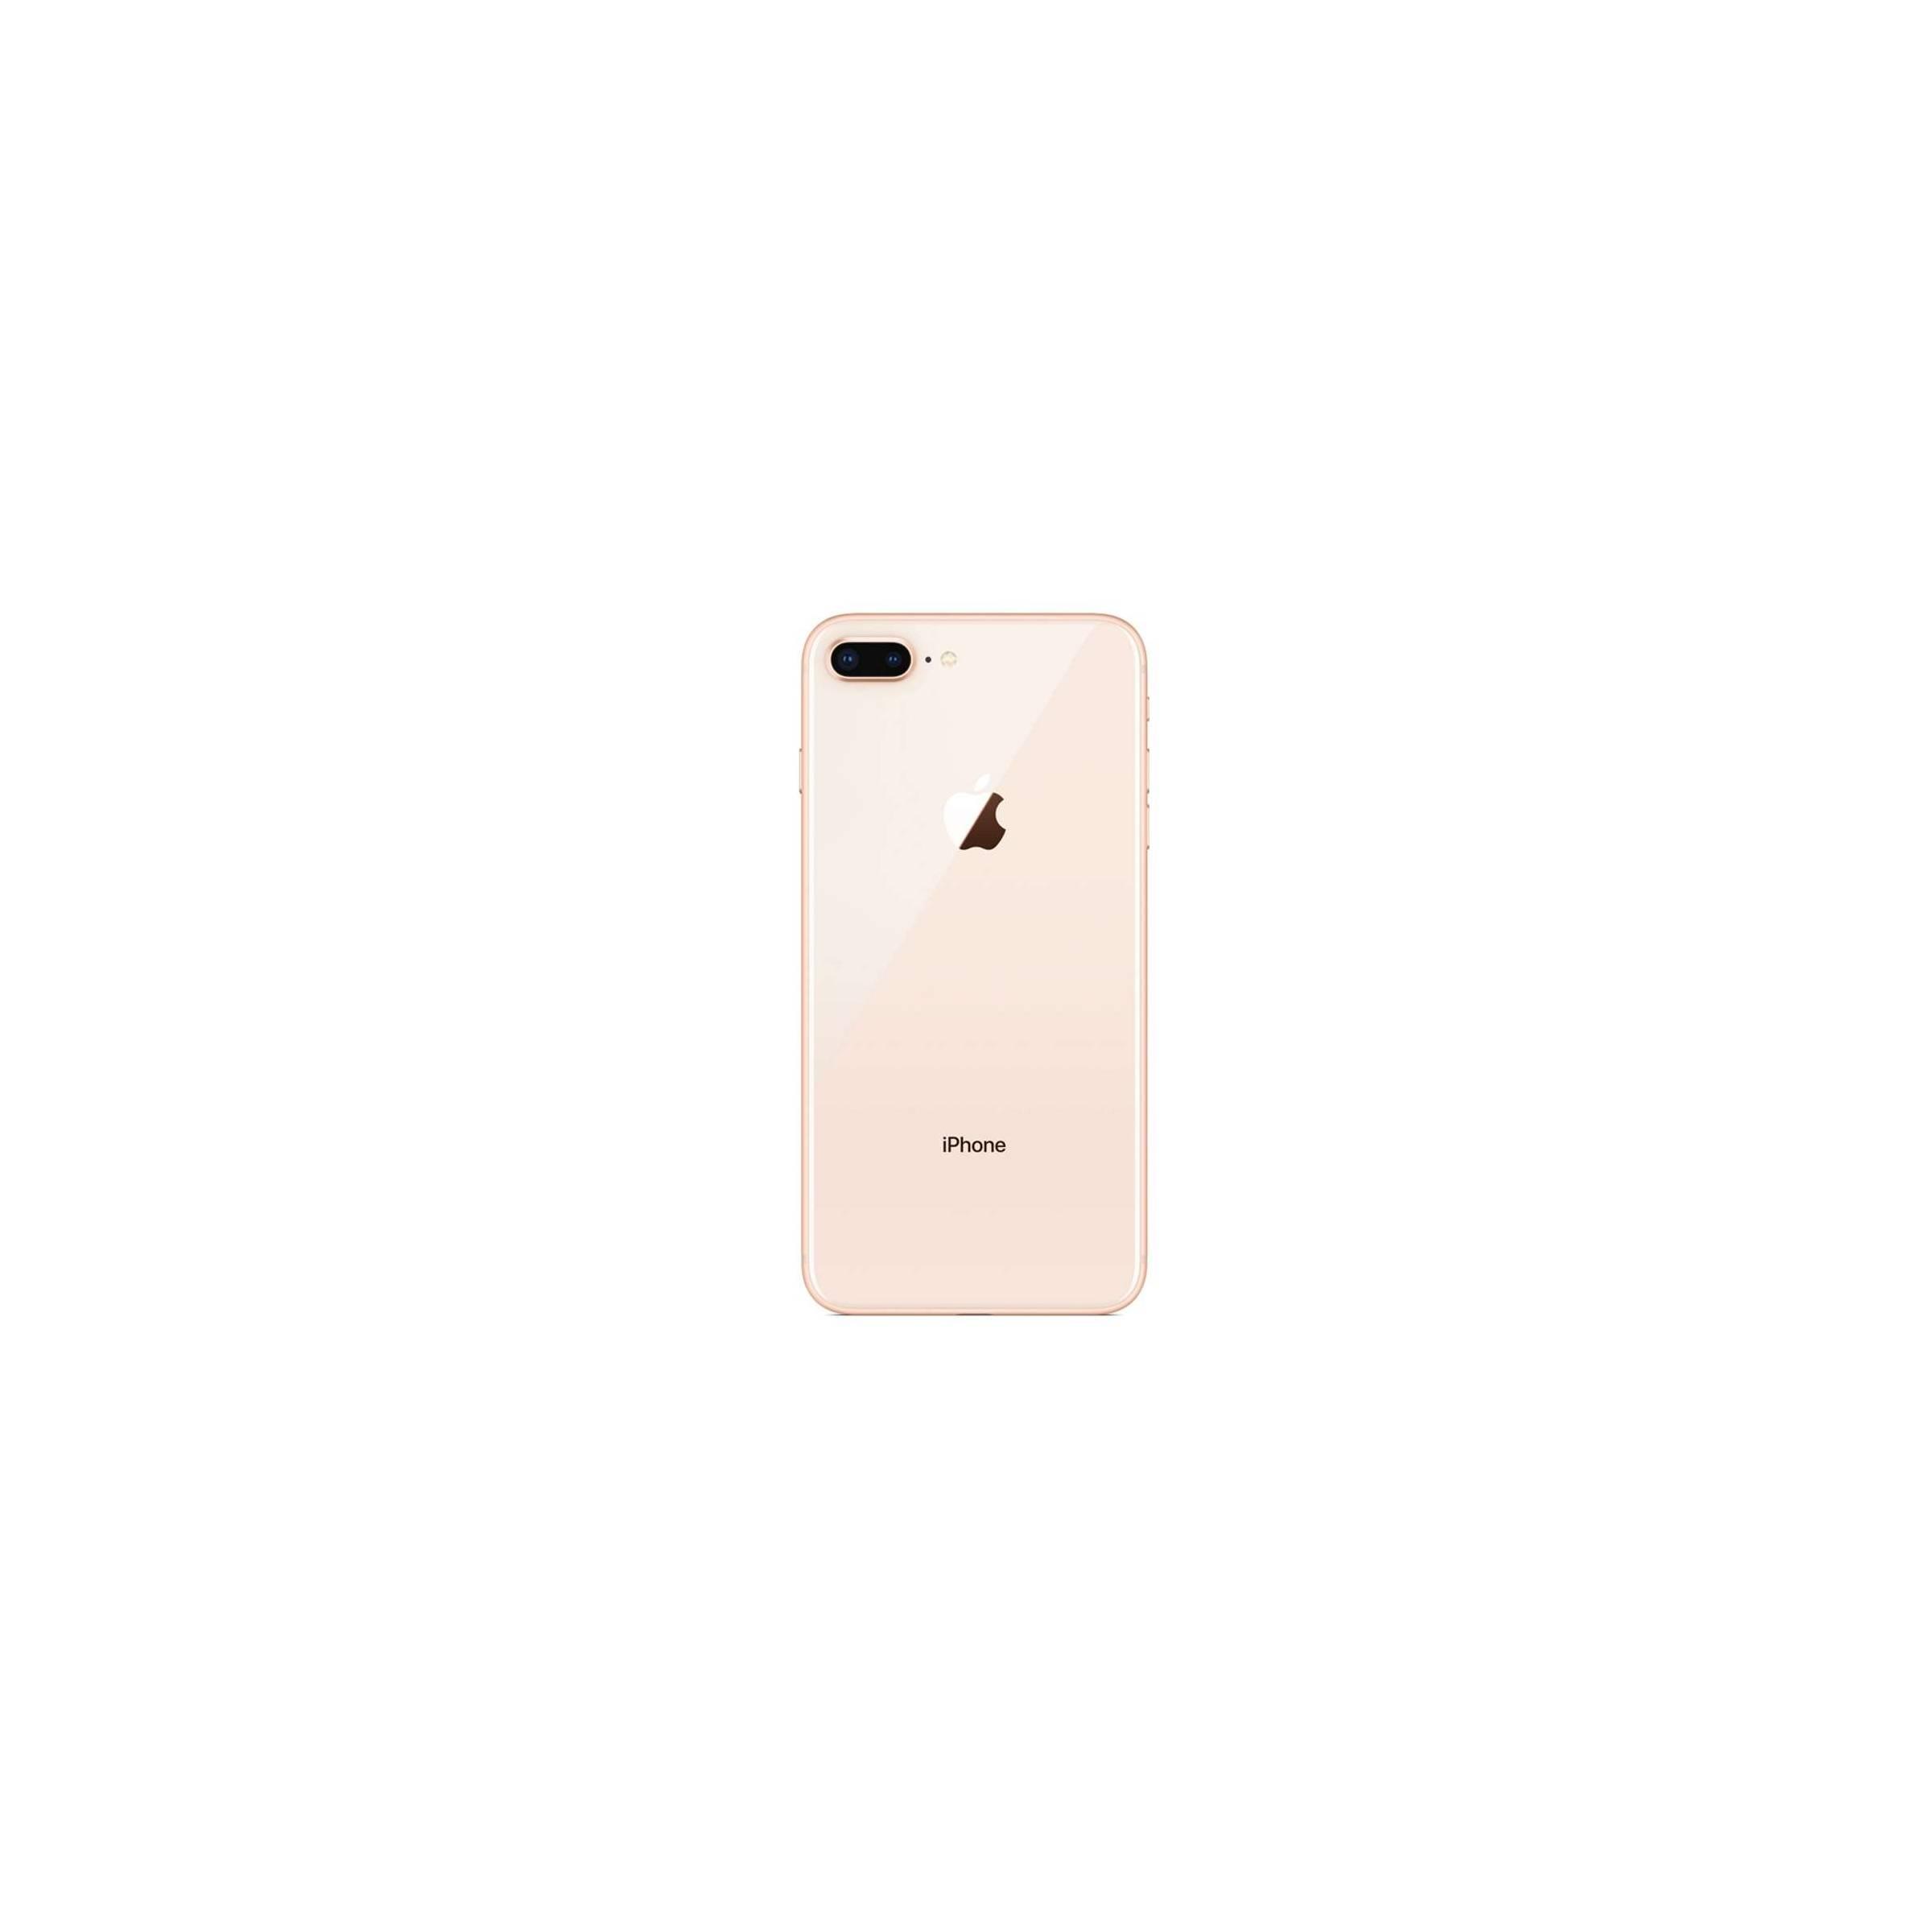 sinox – Iphone 8 plus housing farve guld på mackabler.dk